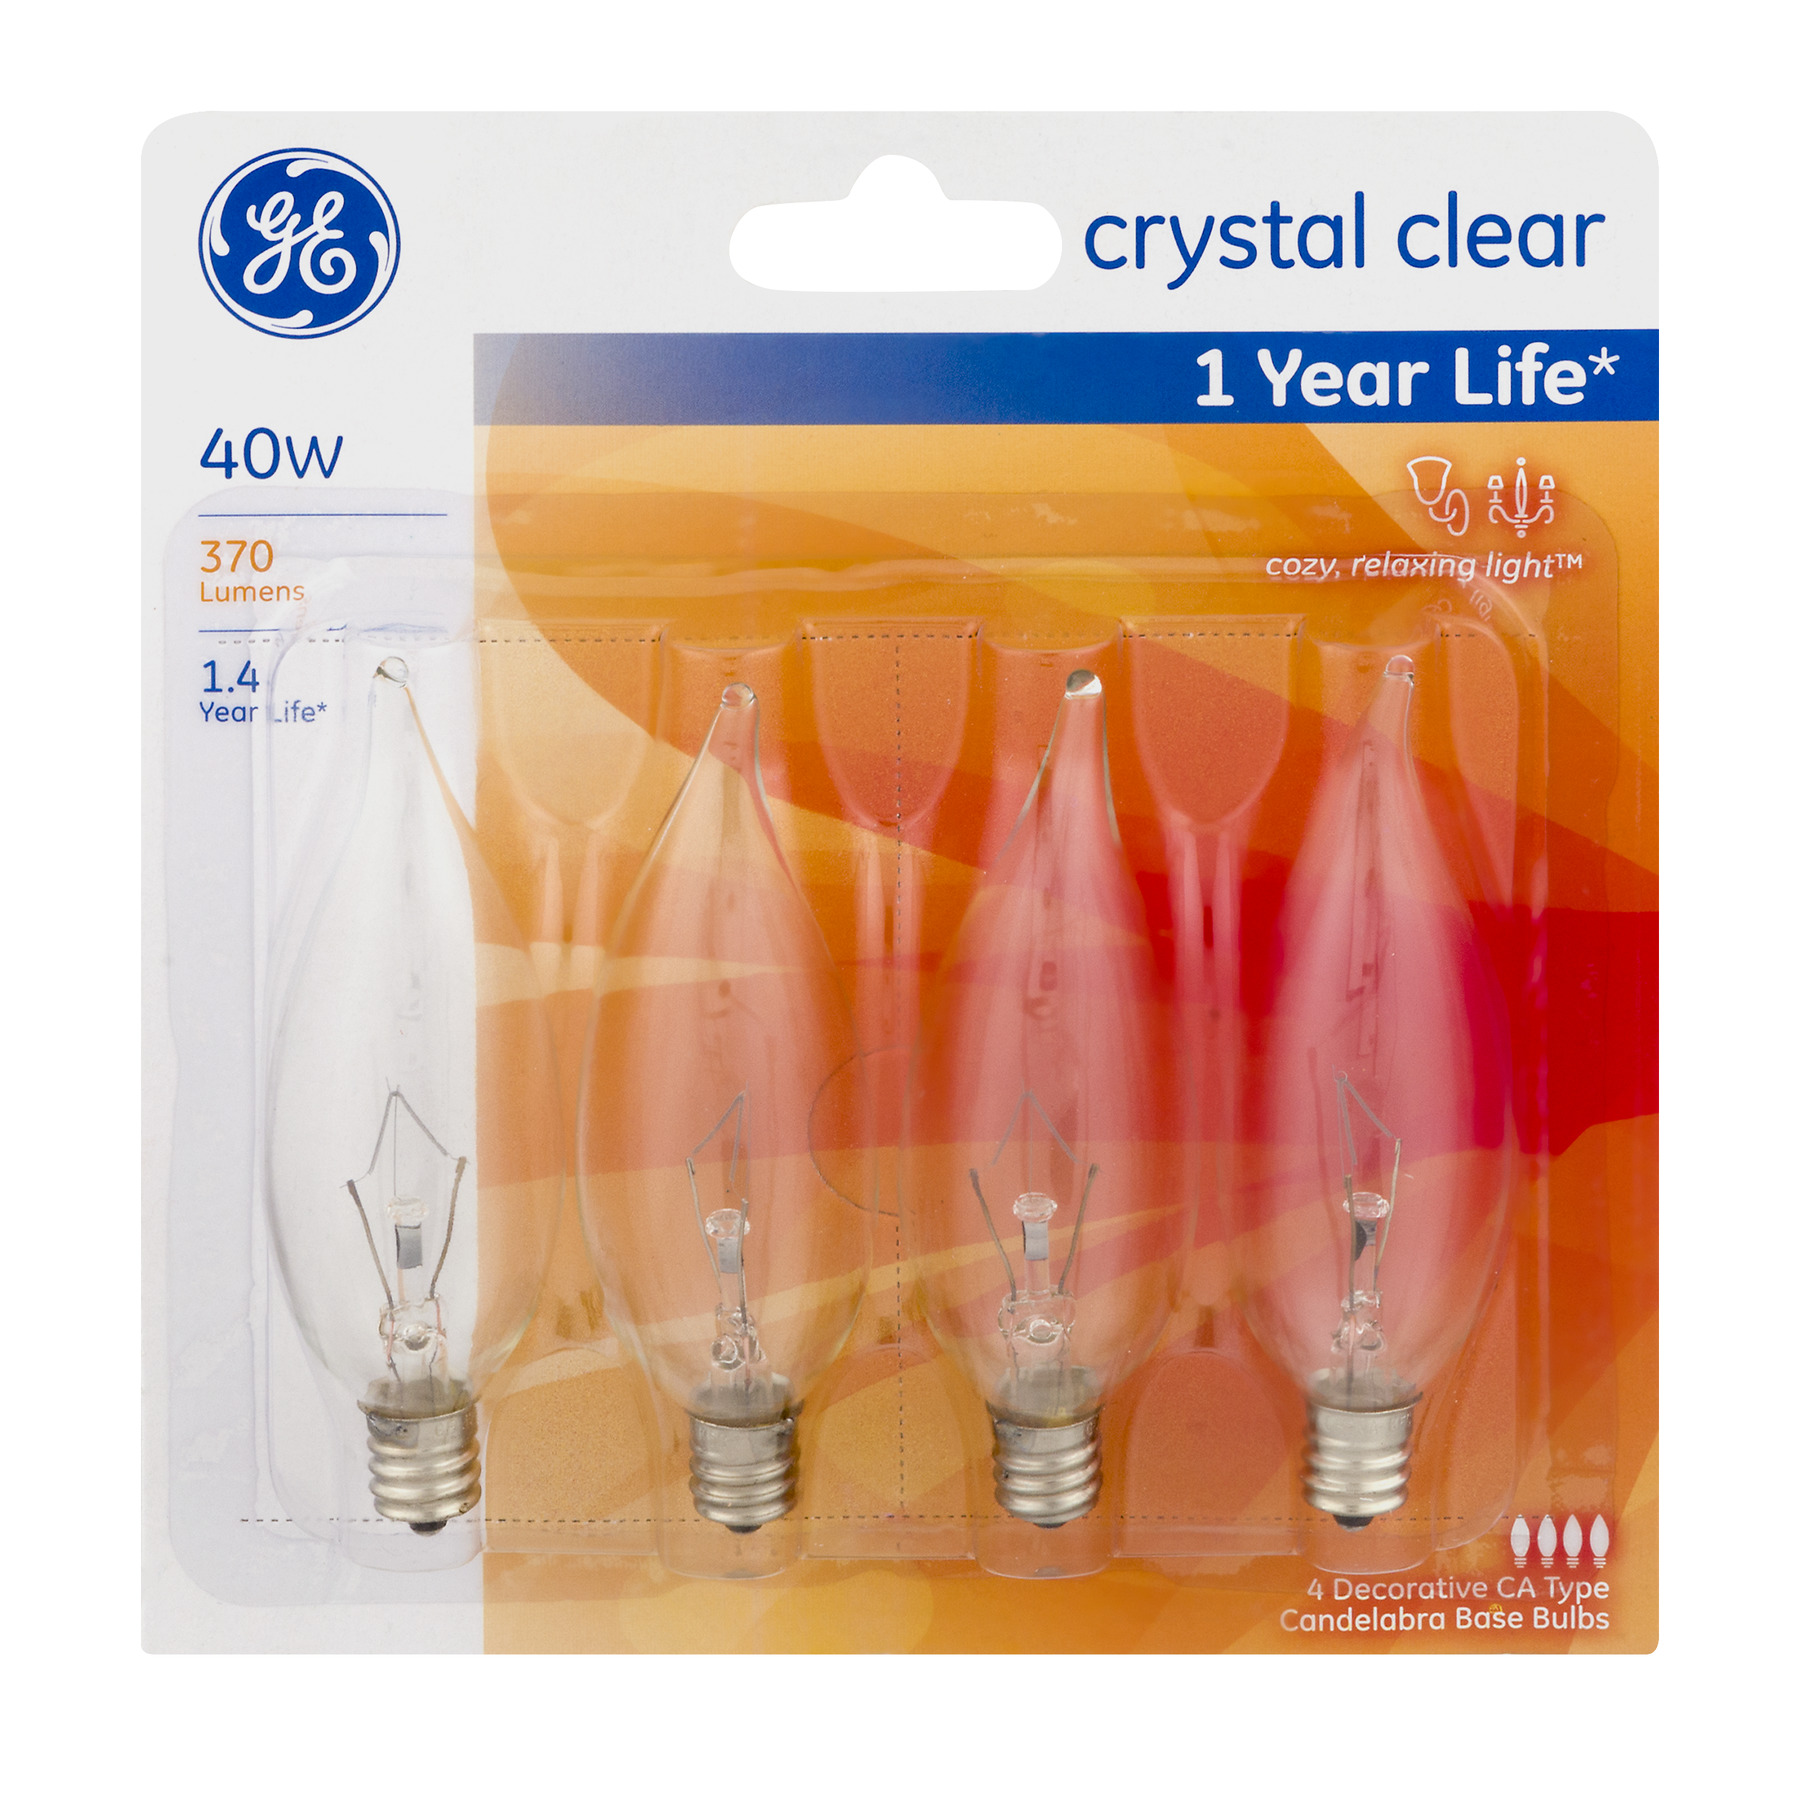 GE Lightbulb Crystal Clear 40W - 4 CT4.0 CT